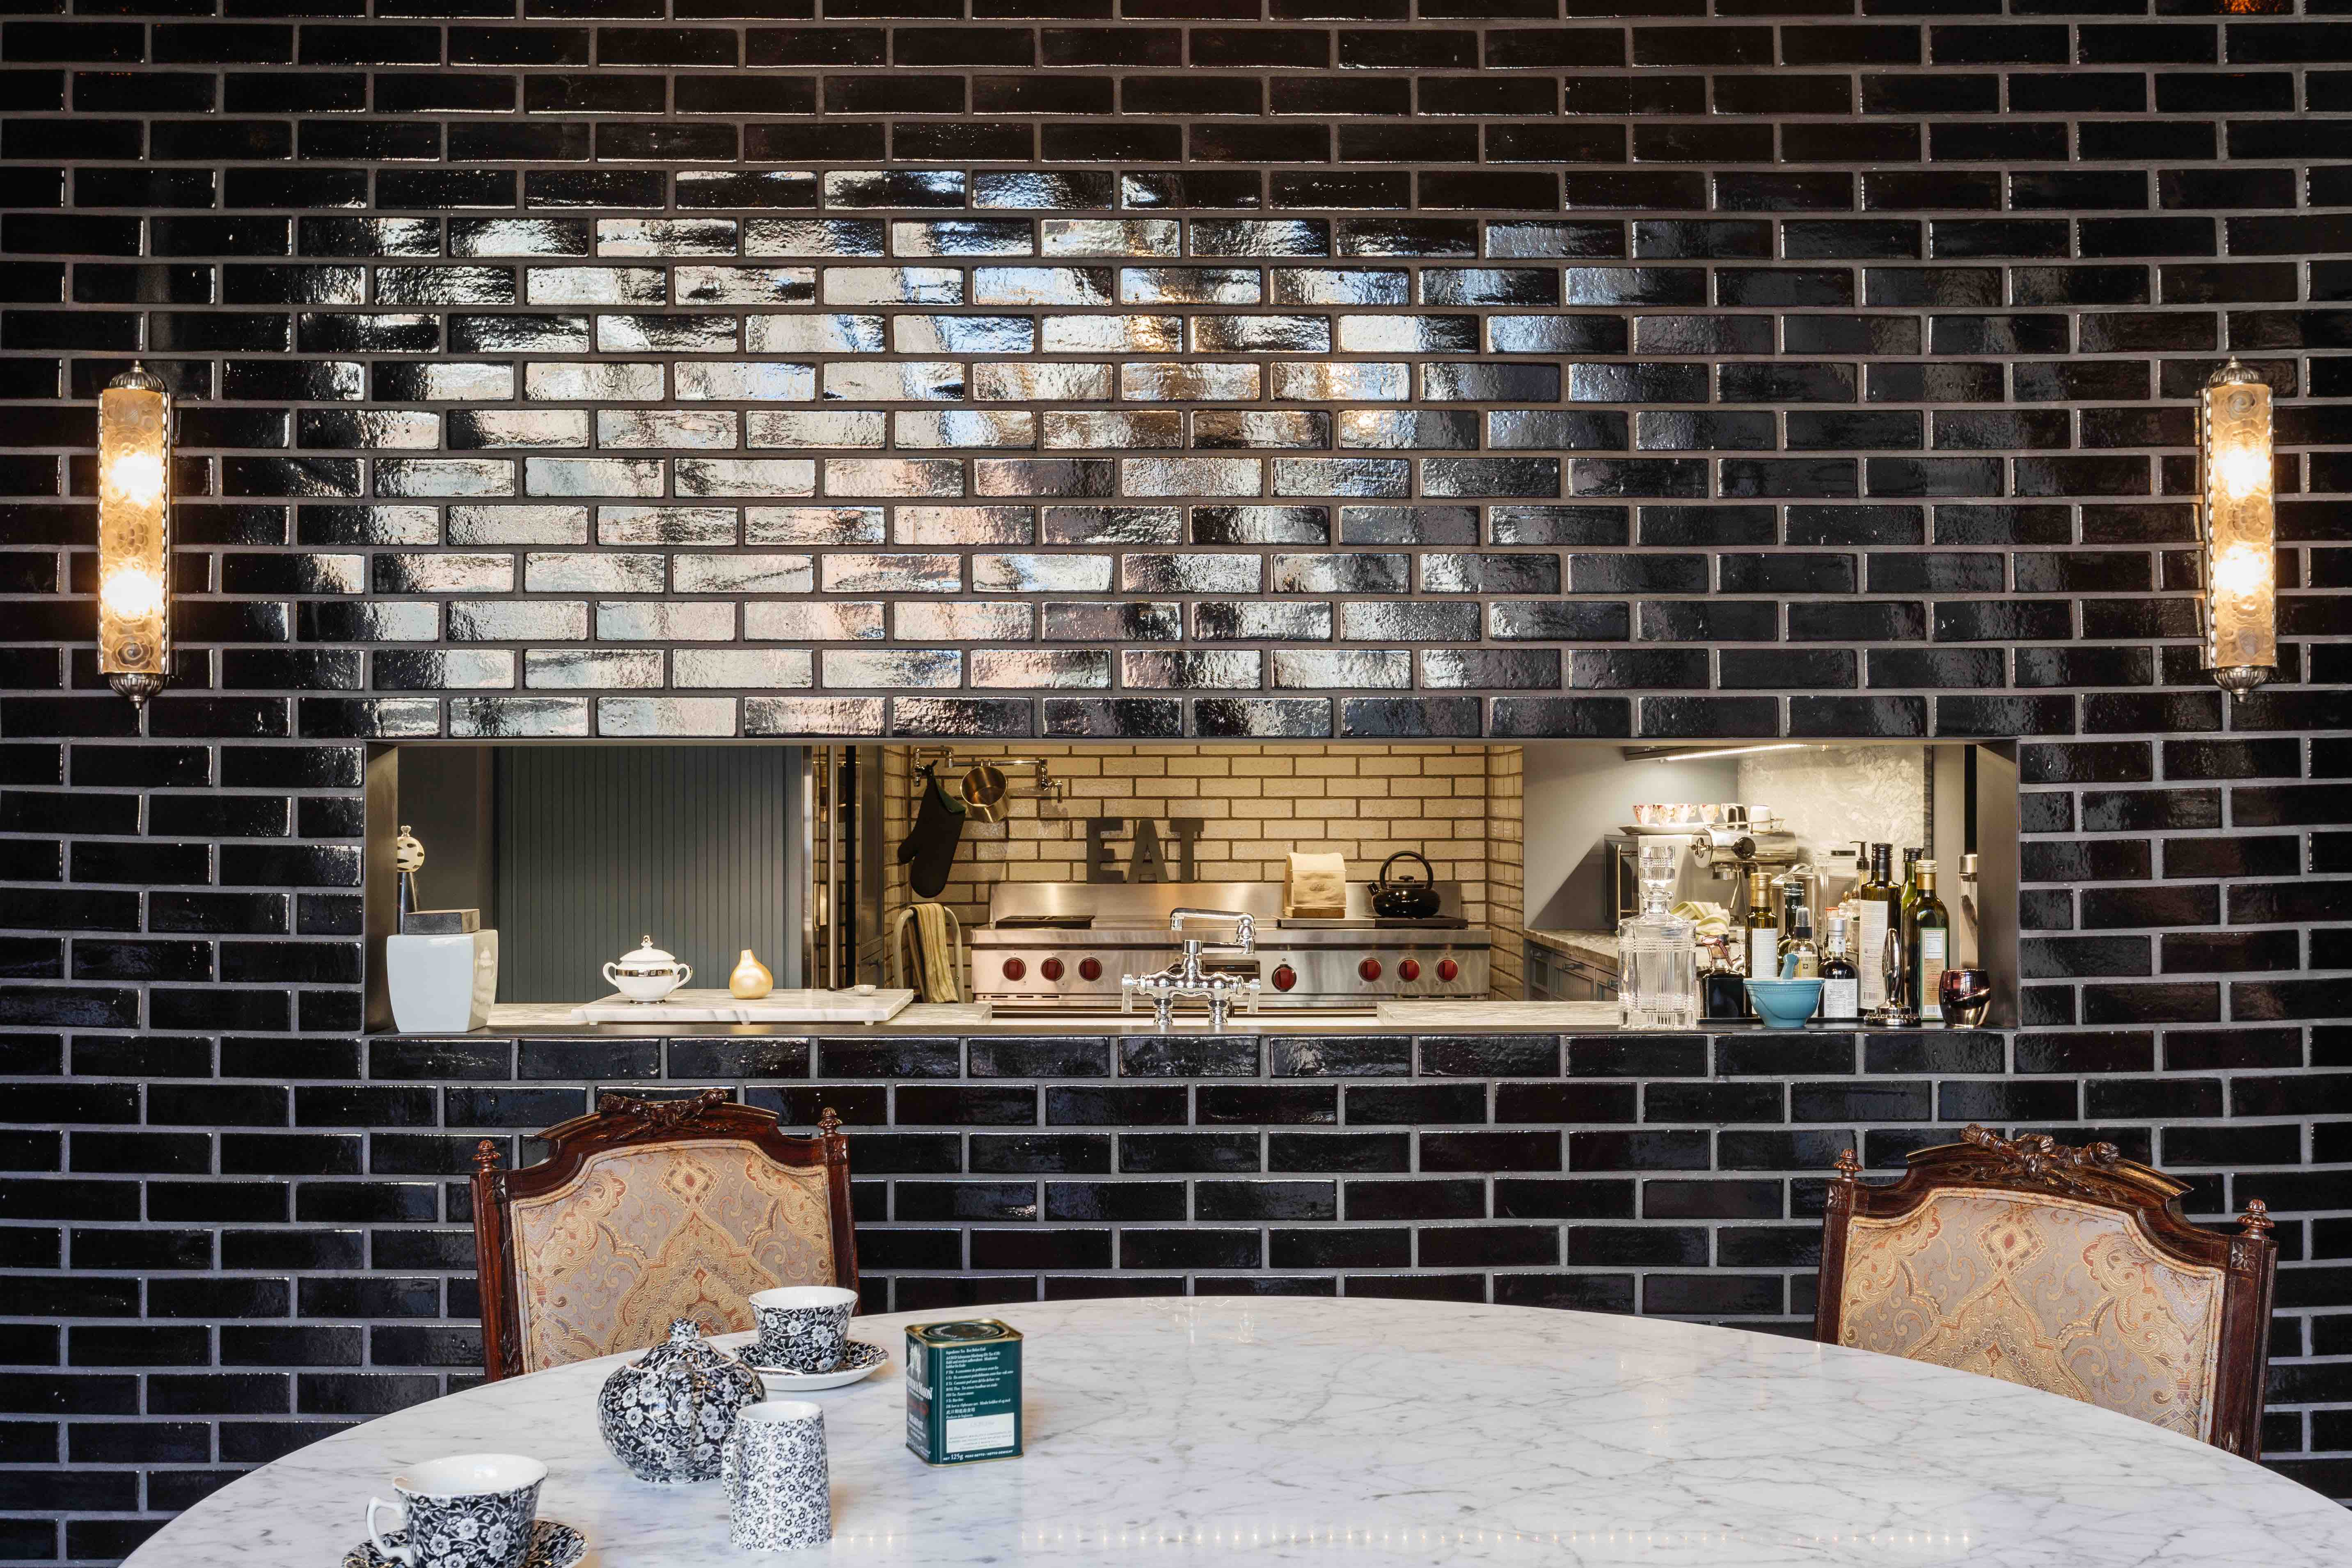 NYC_ALD230_Cornelia_Street_kitchen_2